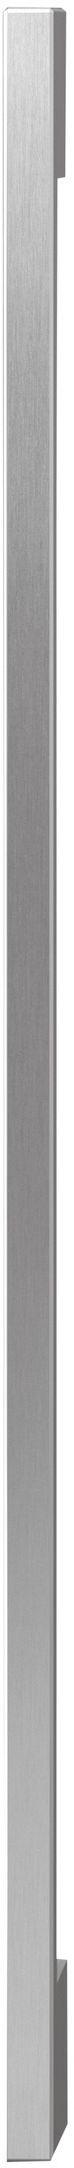 Monogram® Minimalist Stainless Steel Handle Kit-ZXGW1H1CPSS